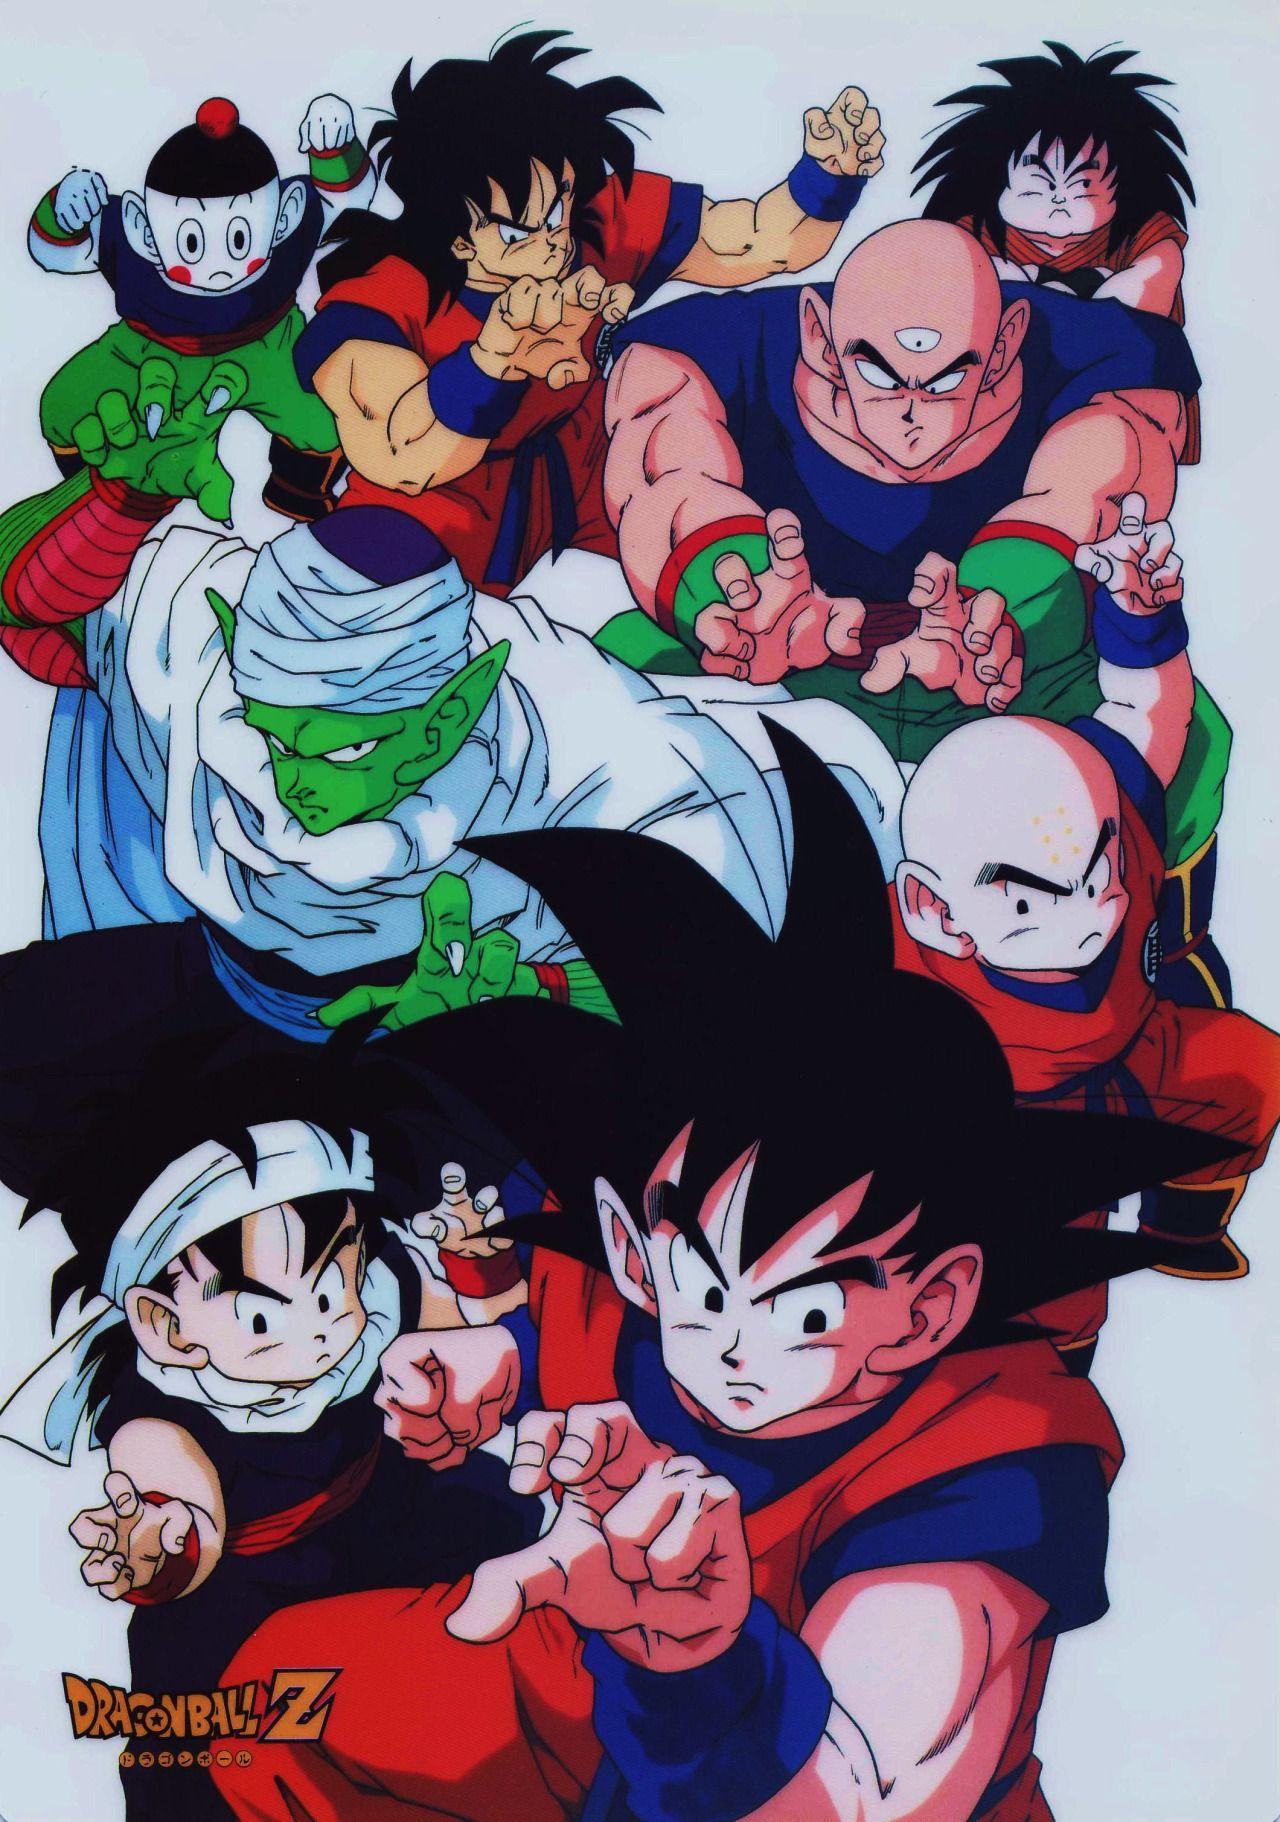 Scan from Dragon Ball Shitajiki (1991)Published by Animetopia / Fuji TV / Toei Animation / Shueisha / Studio Bird / AkiraToriyamasource : personal collection